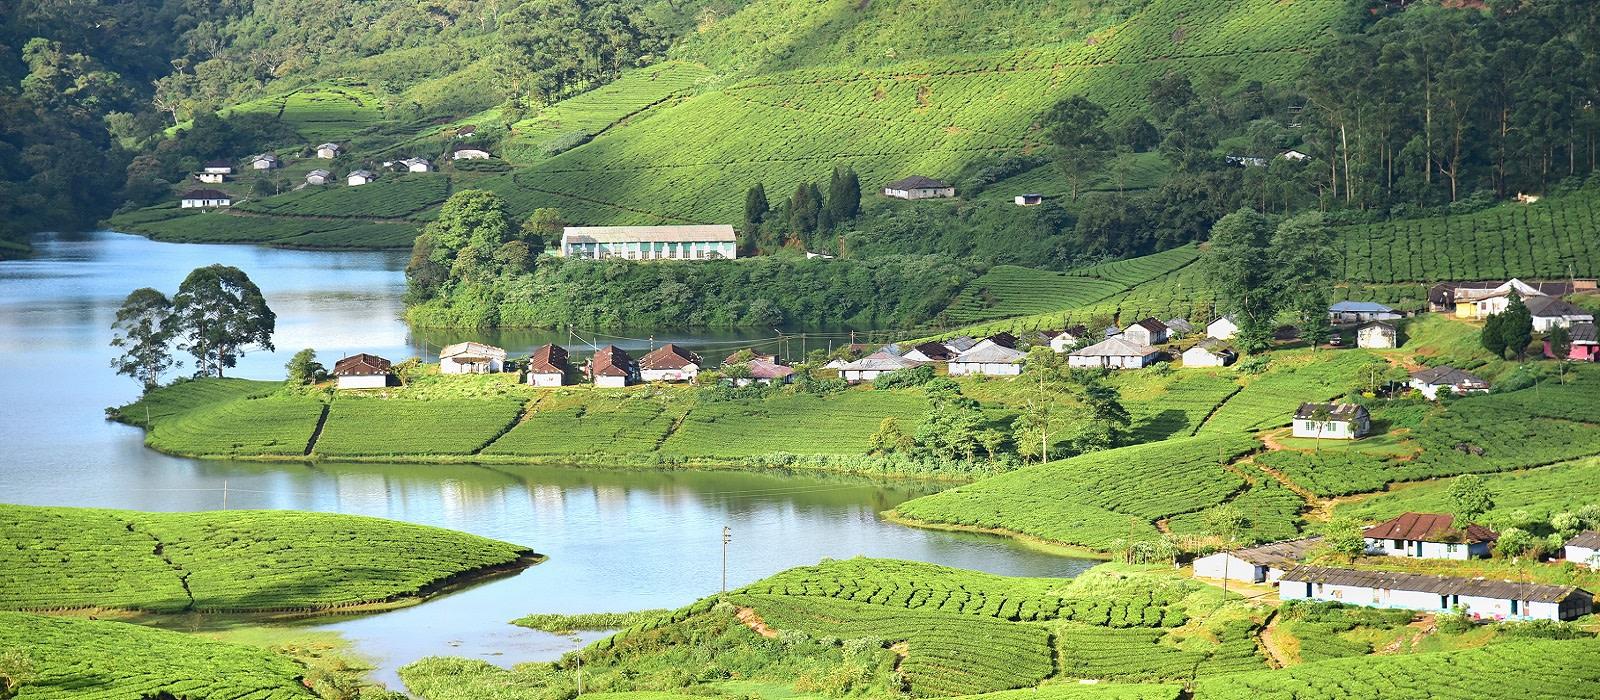 Kerala: Temples, Tea Plantations and Backwaters Tour Trip 1